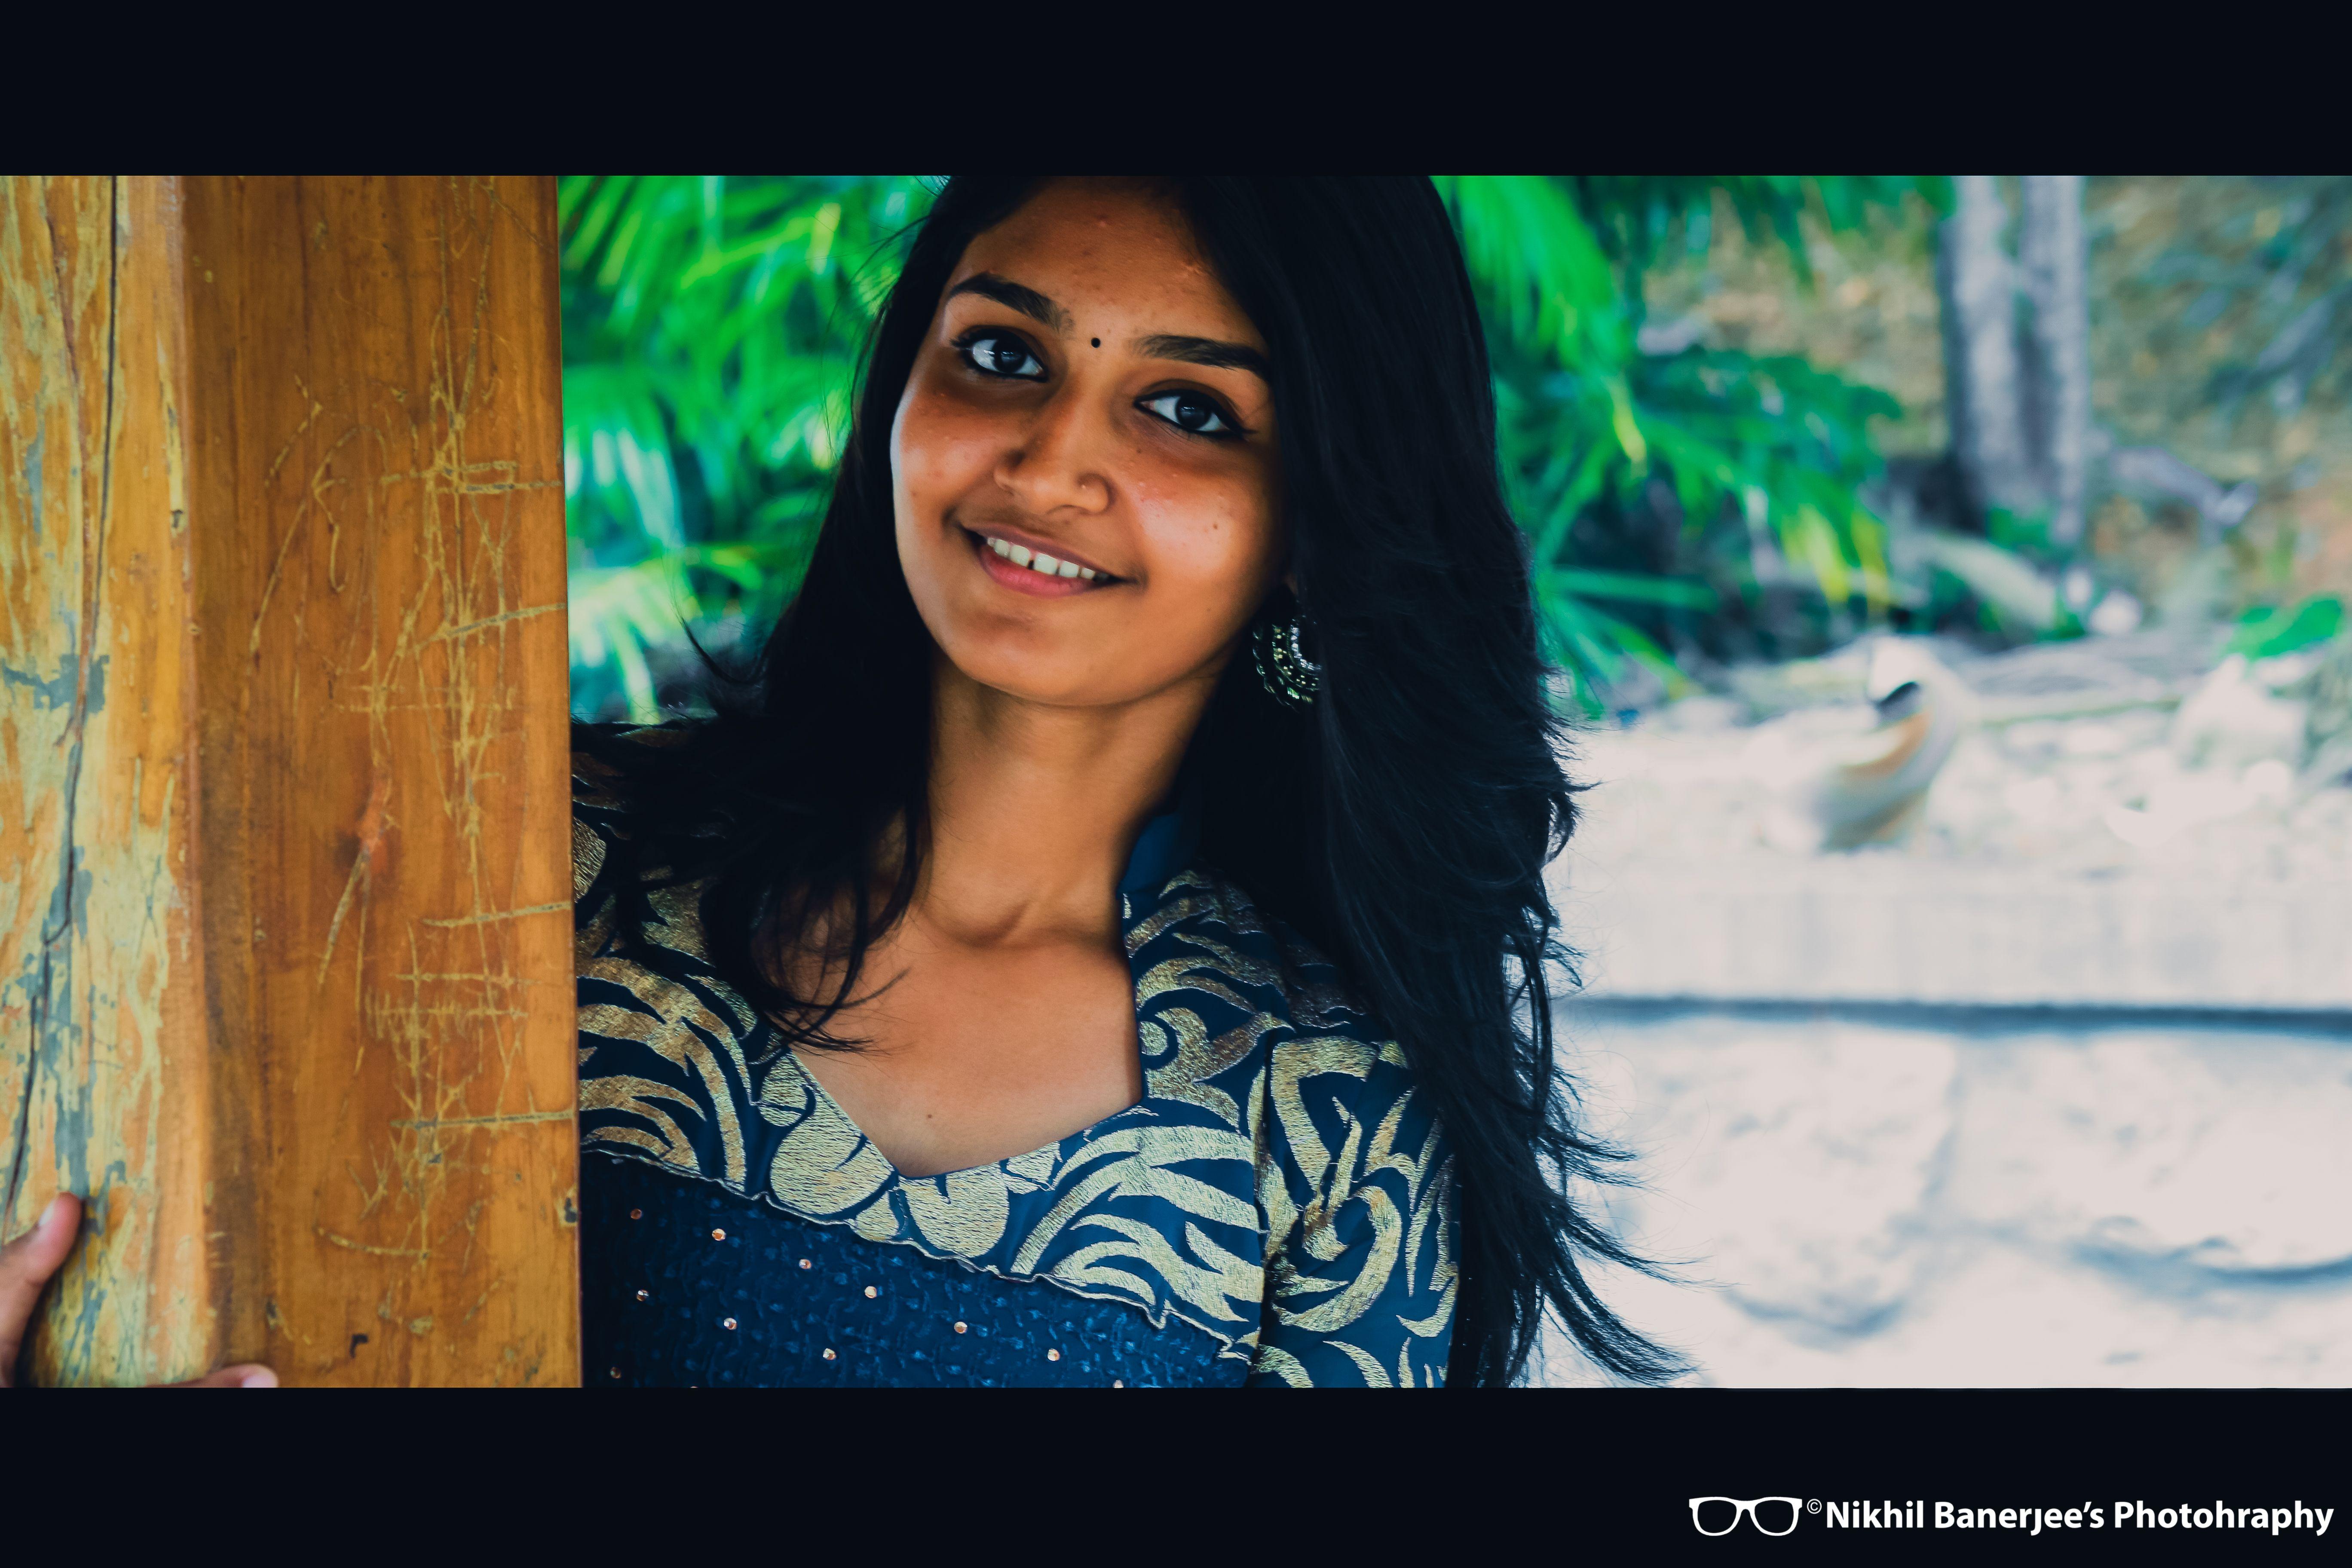 Pin By Nikhil Banerjee On Nikhil Banerjee S Photography